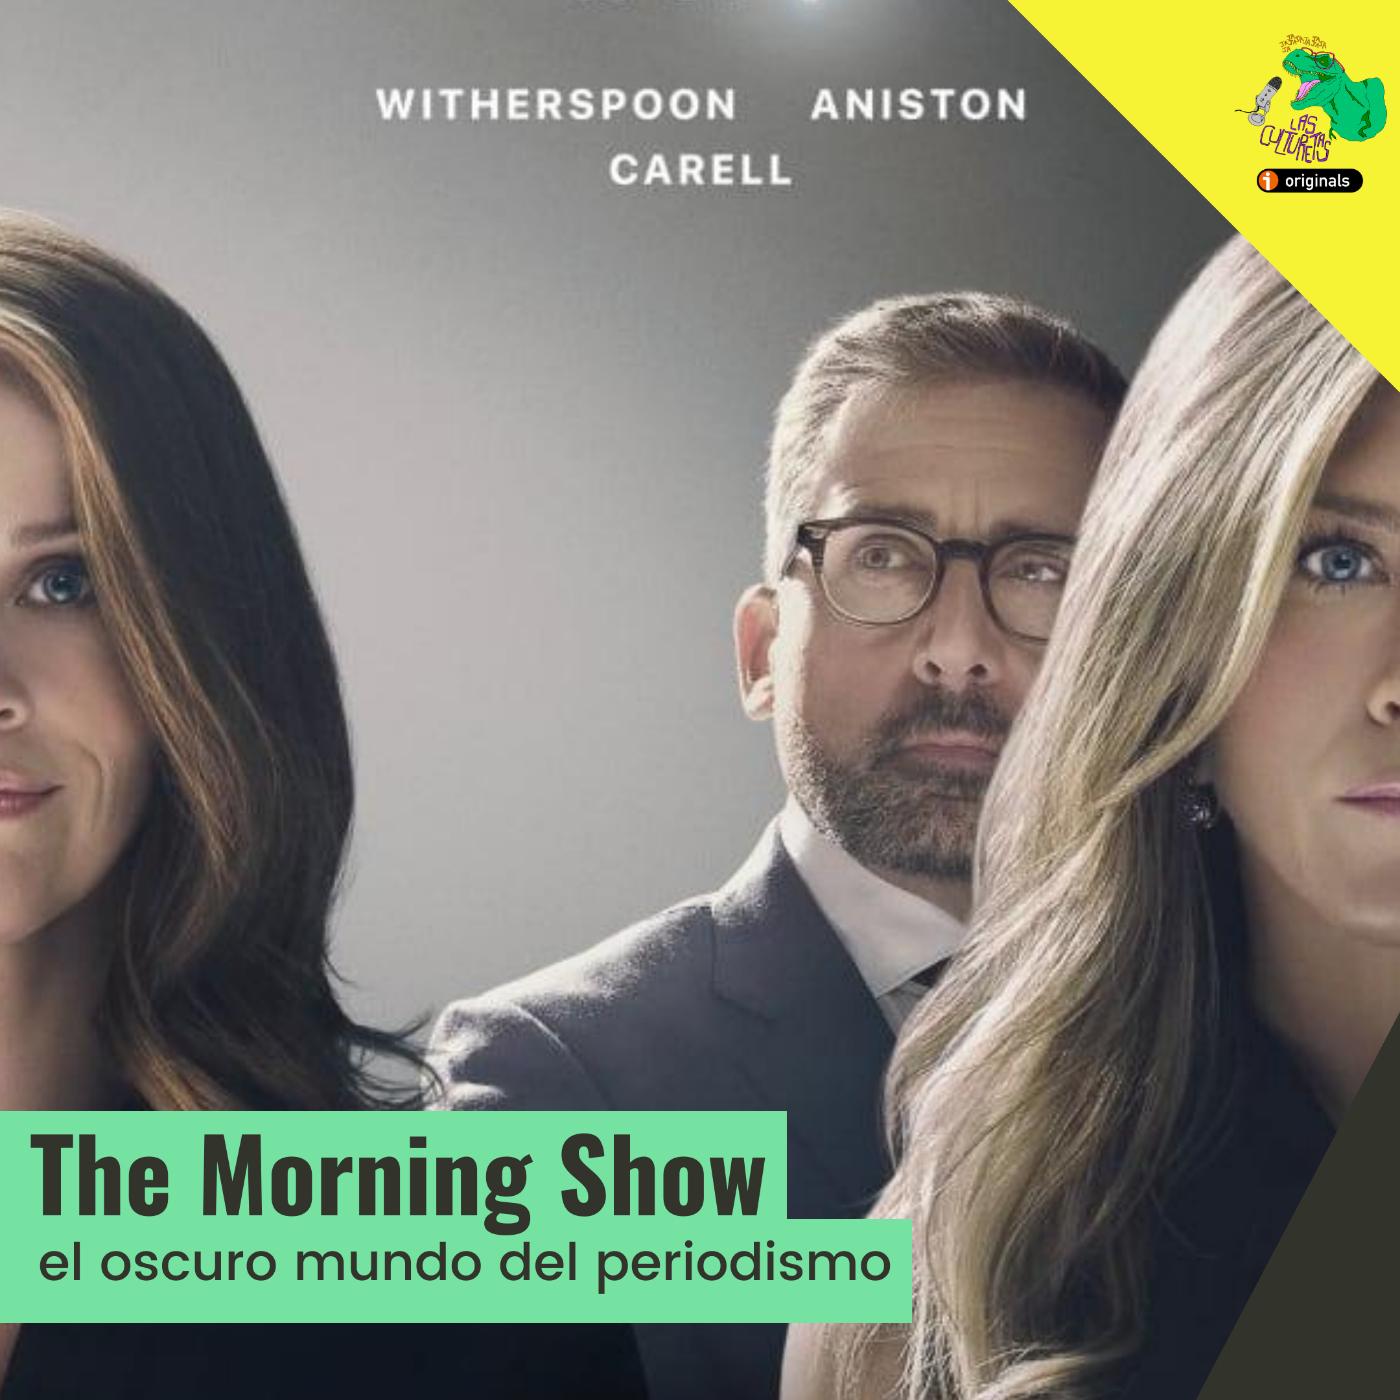 The Morning Show: el oscuro mundo del periodismo | El Friki